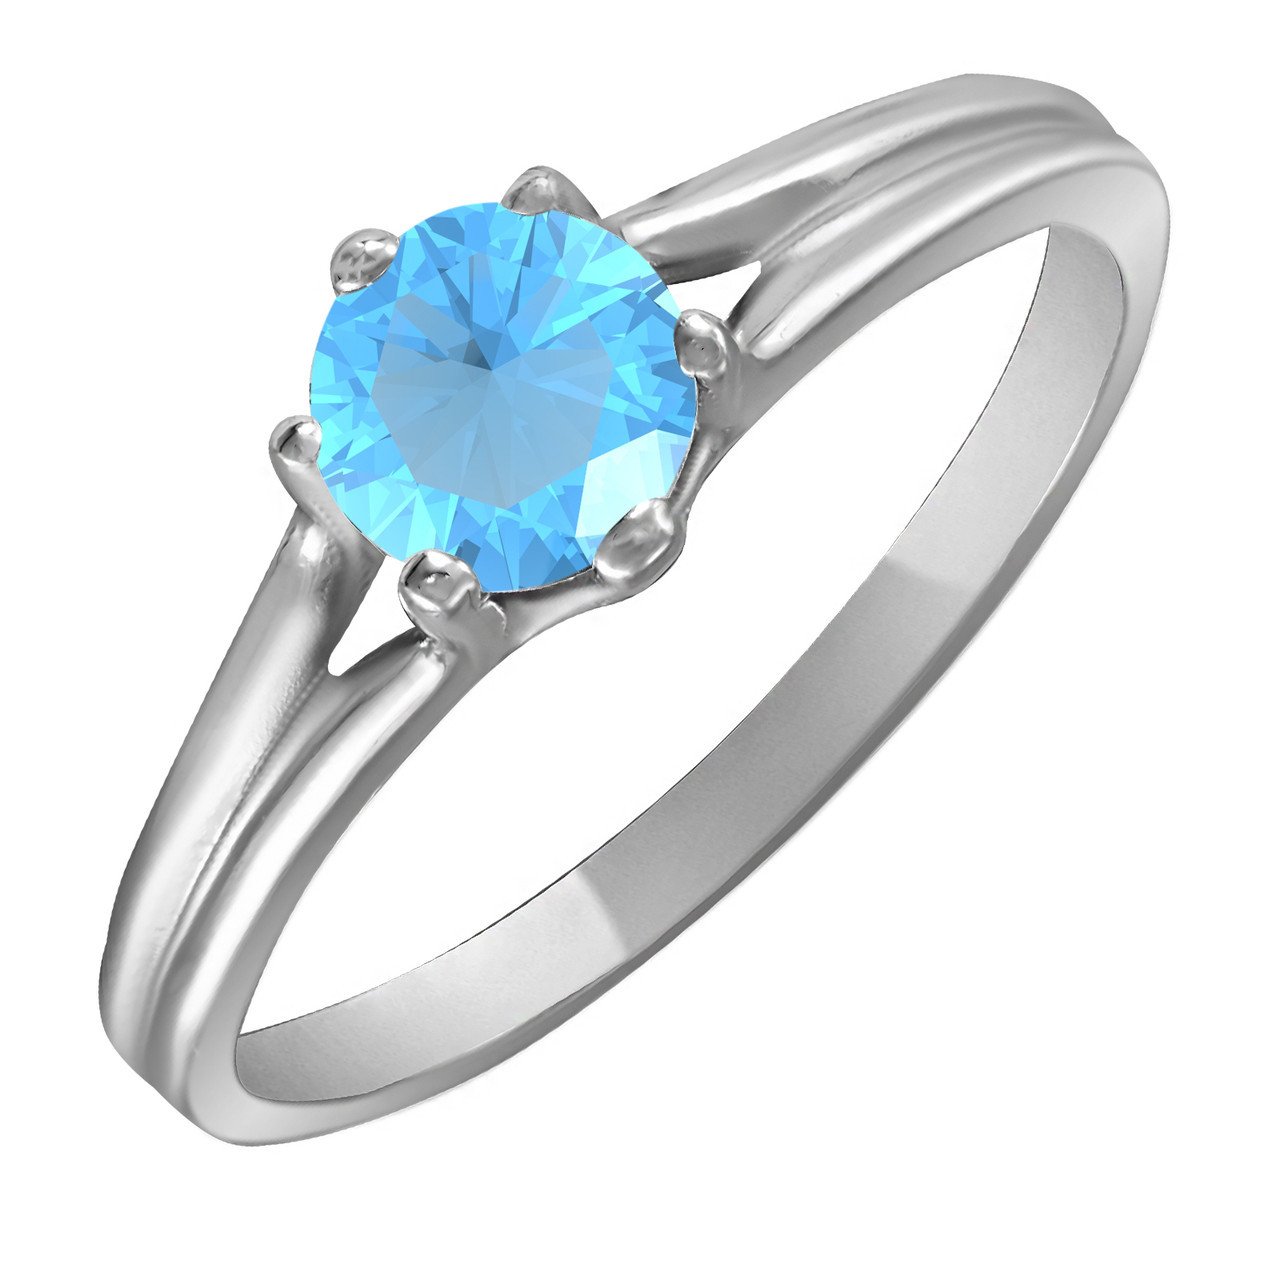 Кольцо из серебра с голубым кубическим цирконием Twiddle Jewelry 17.5 размер (К017г-17.5)